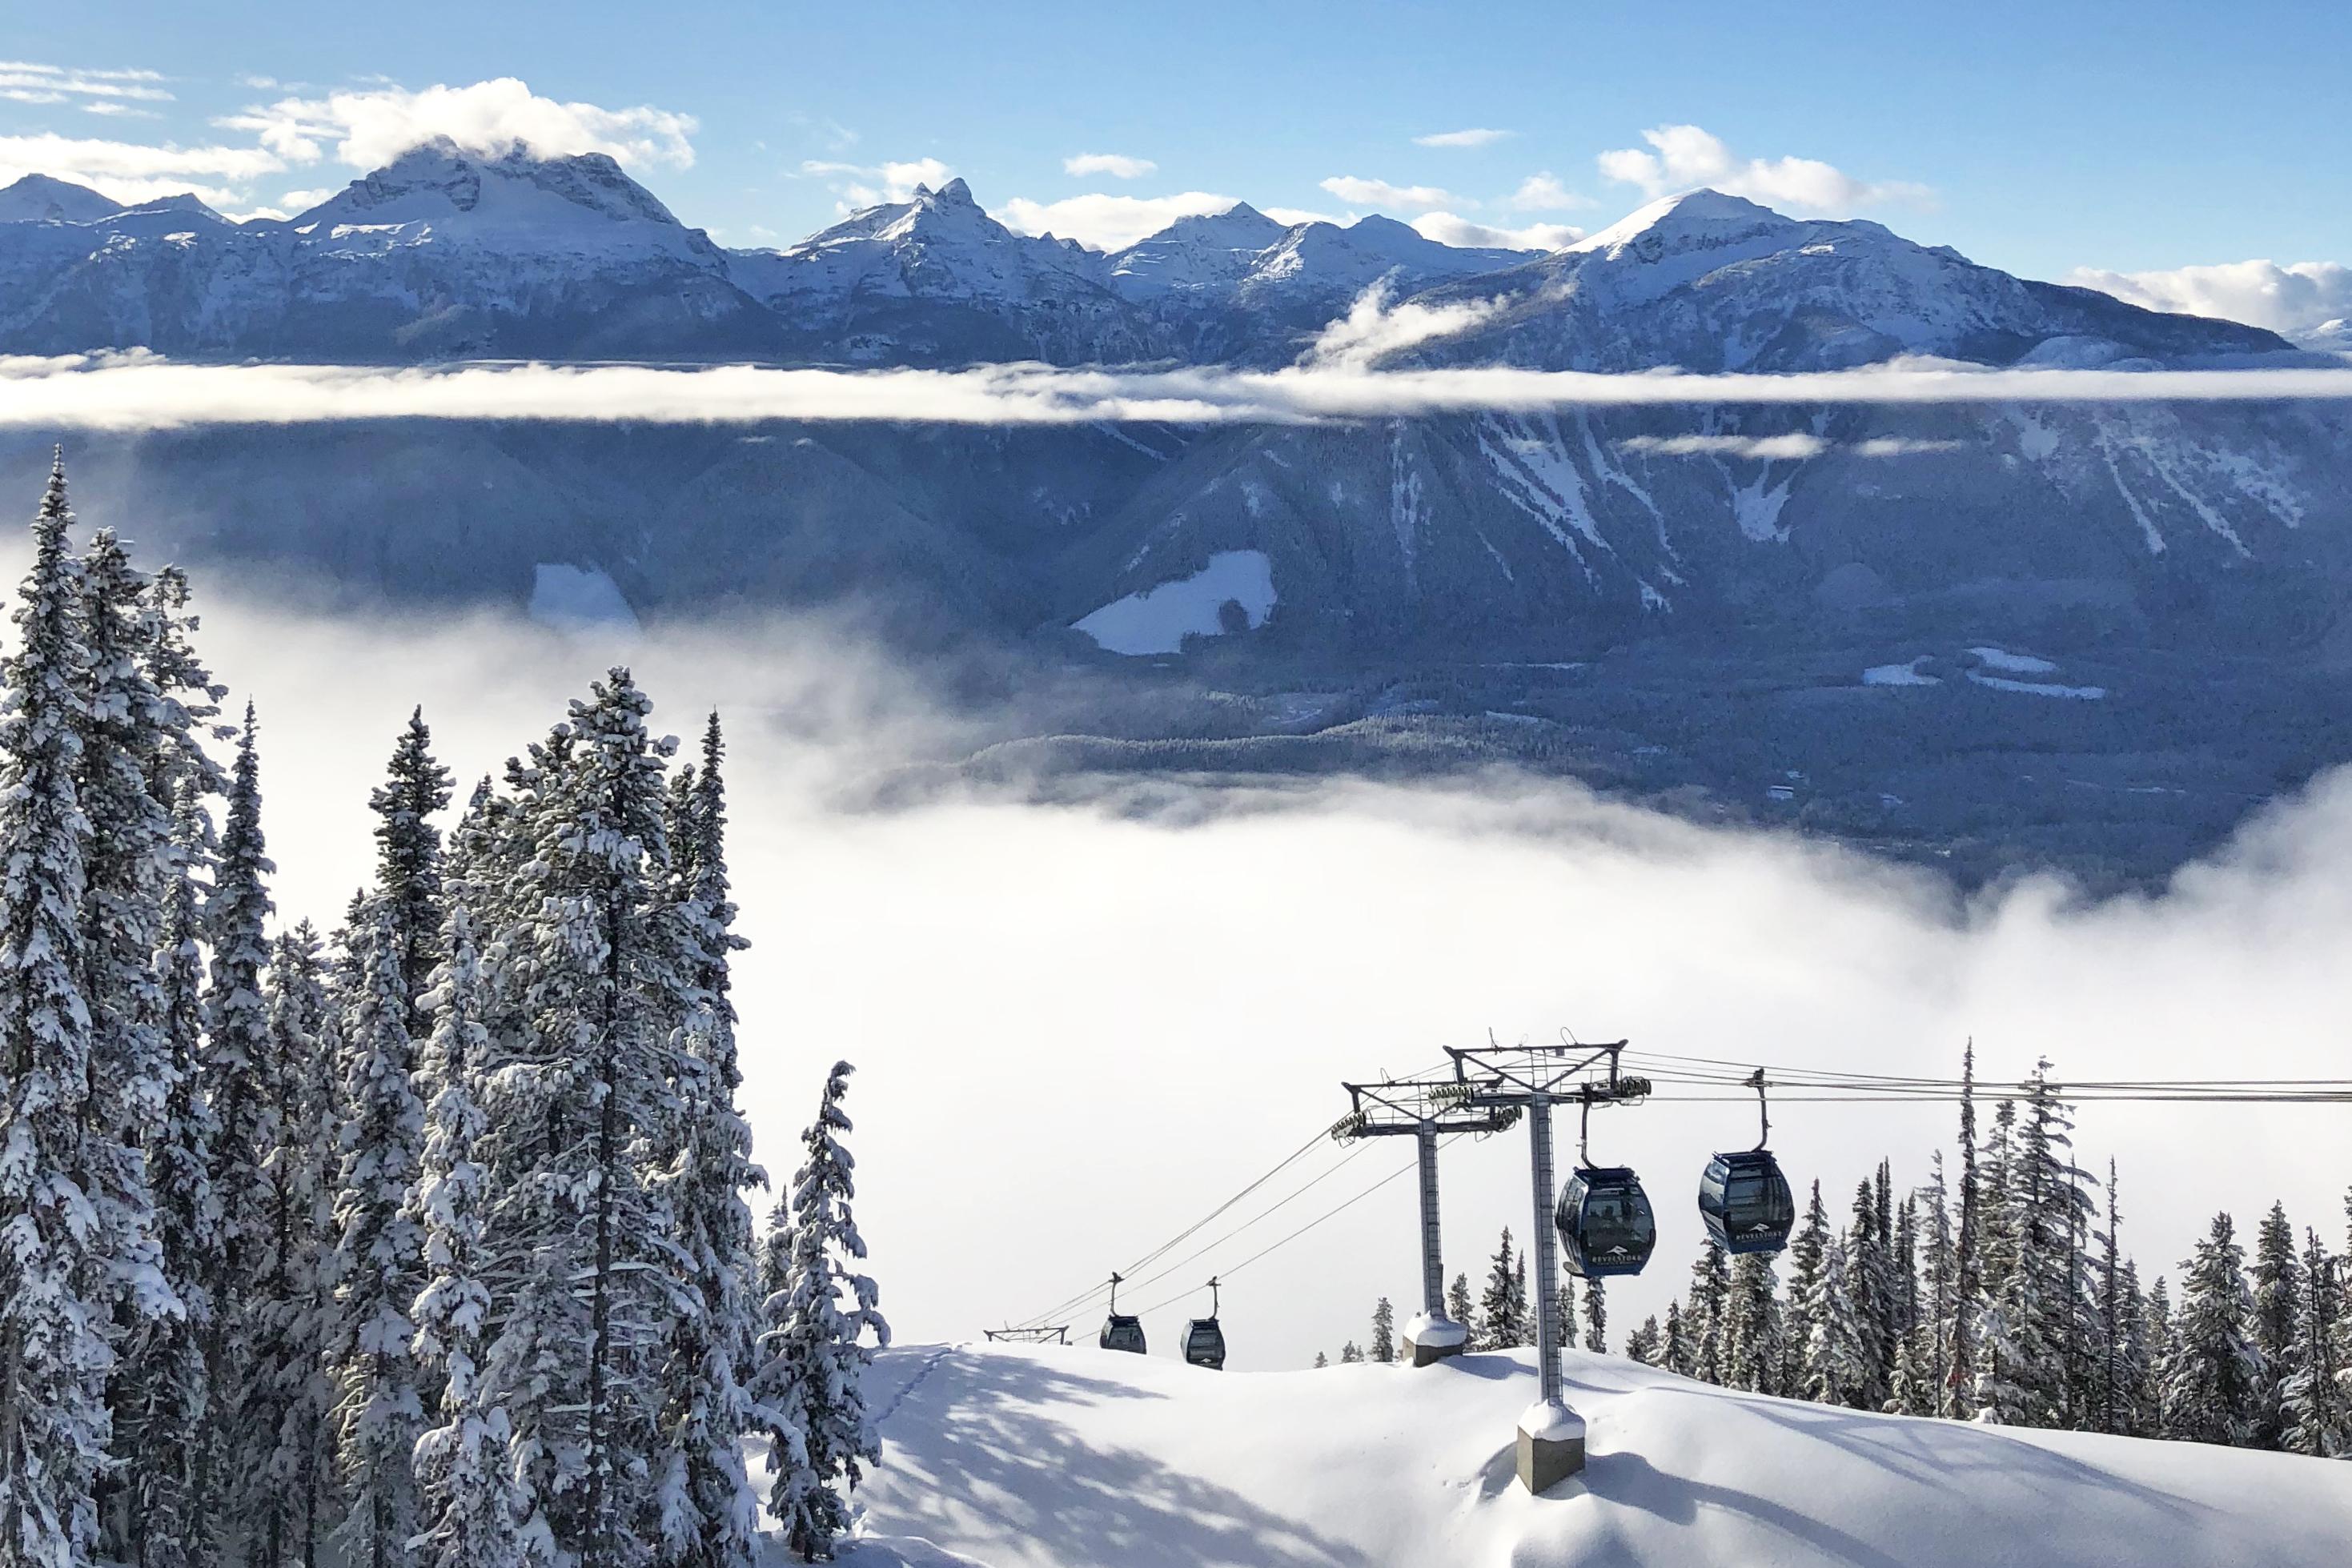 Revelstoke Skiing